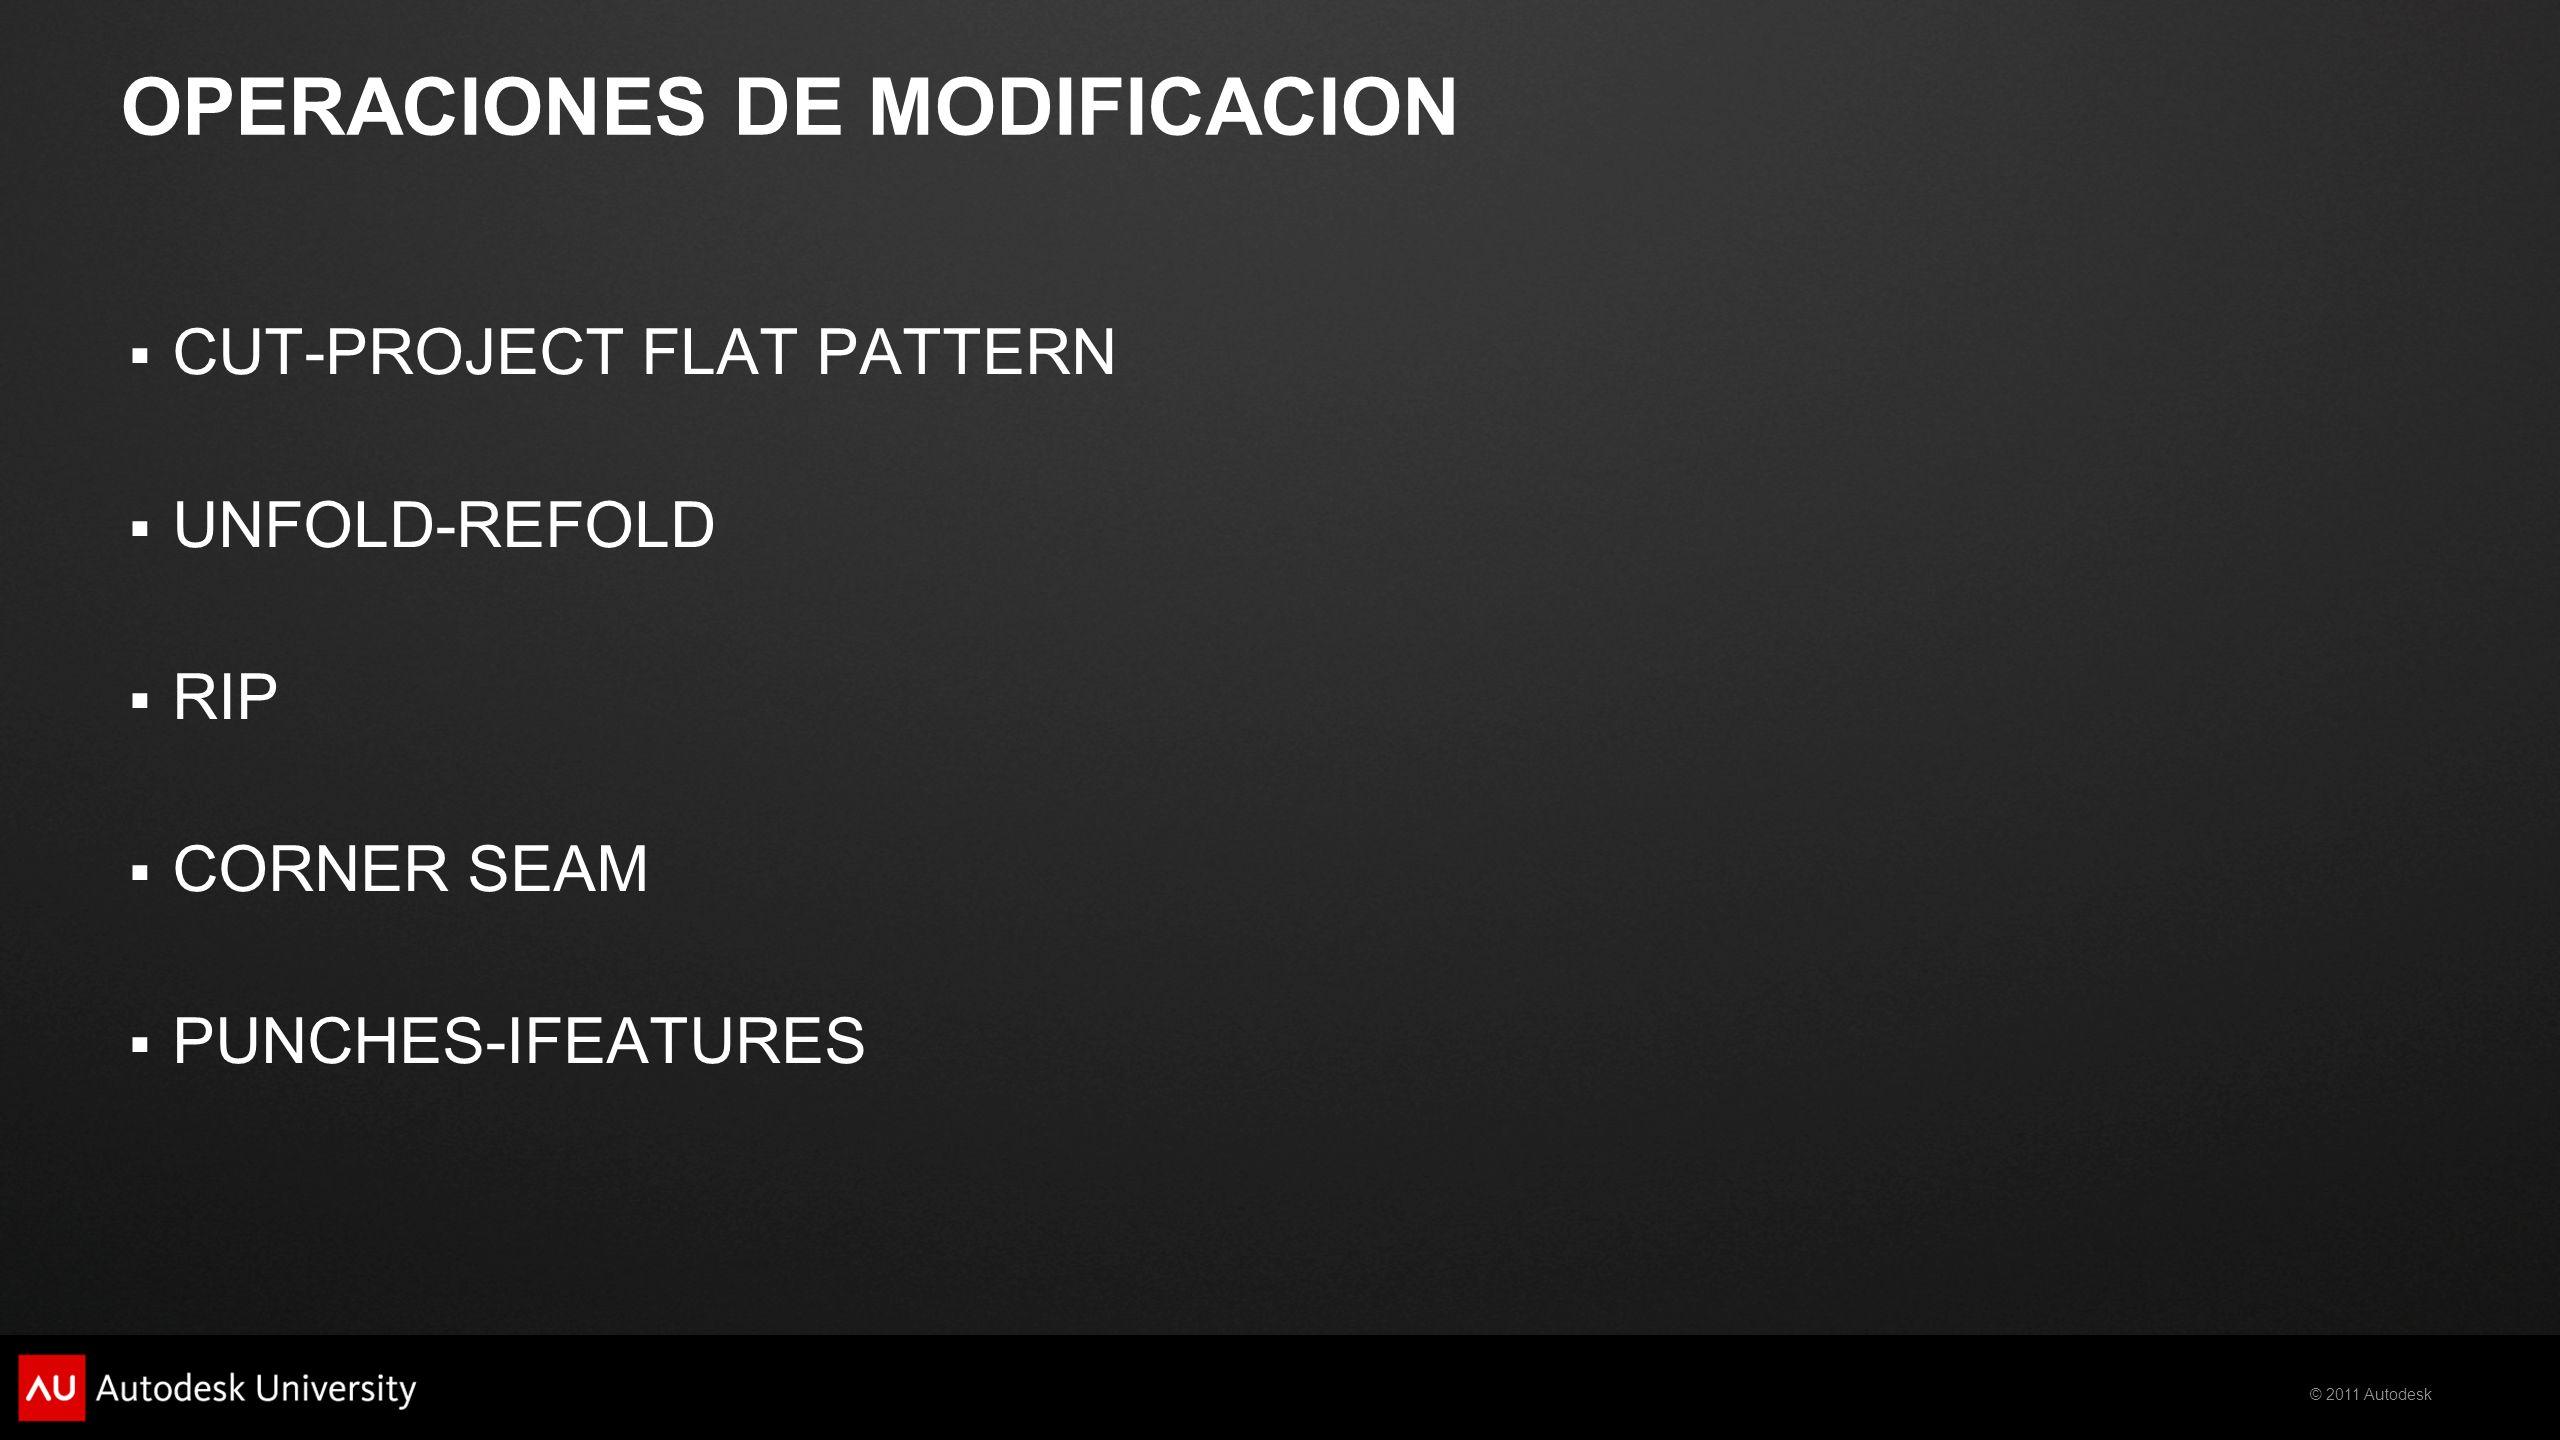 OPERACIONES DE MODIFICACION